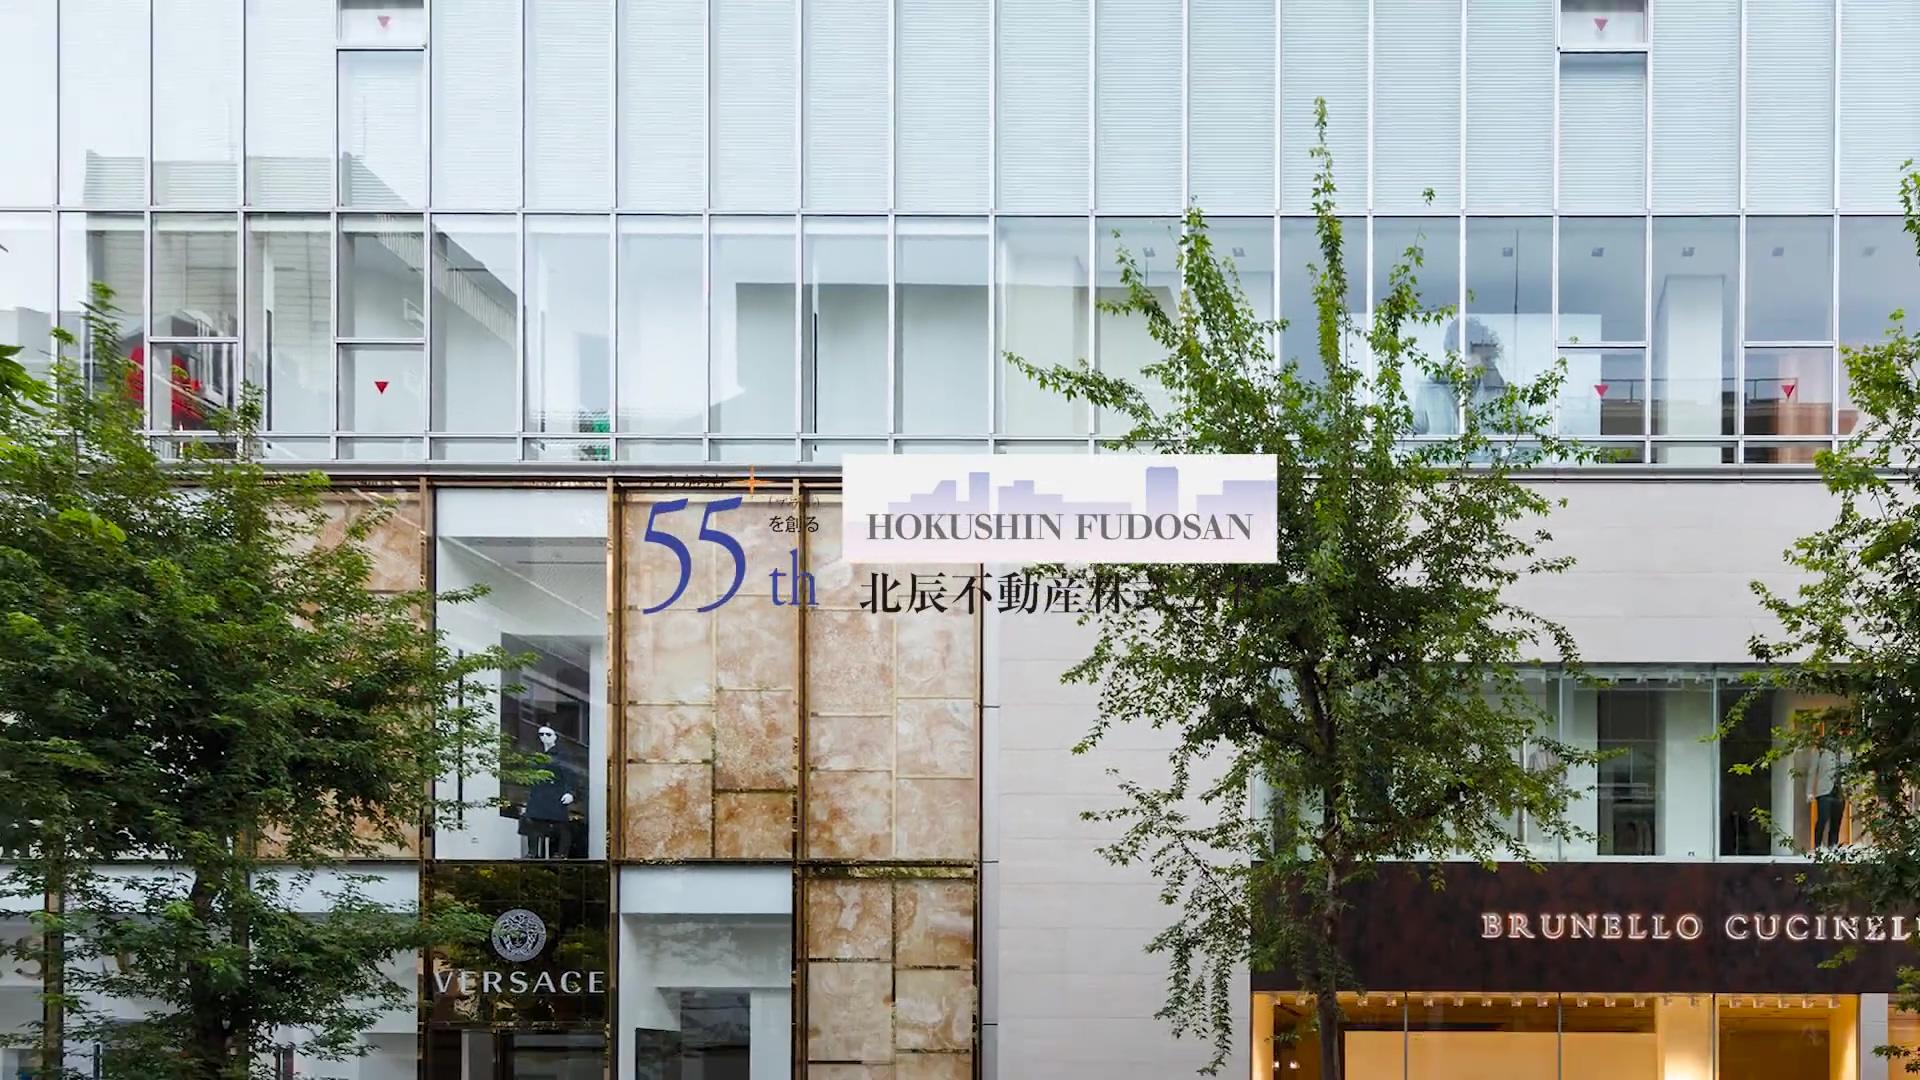 hokushinfudosan_our_business